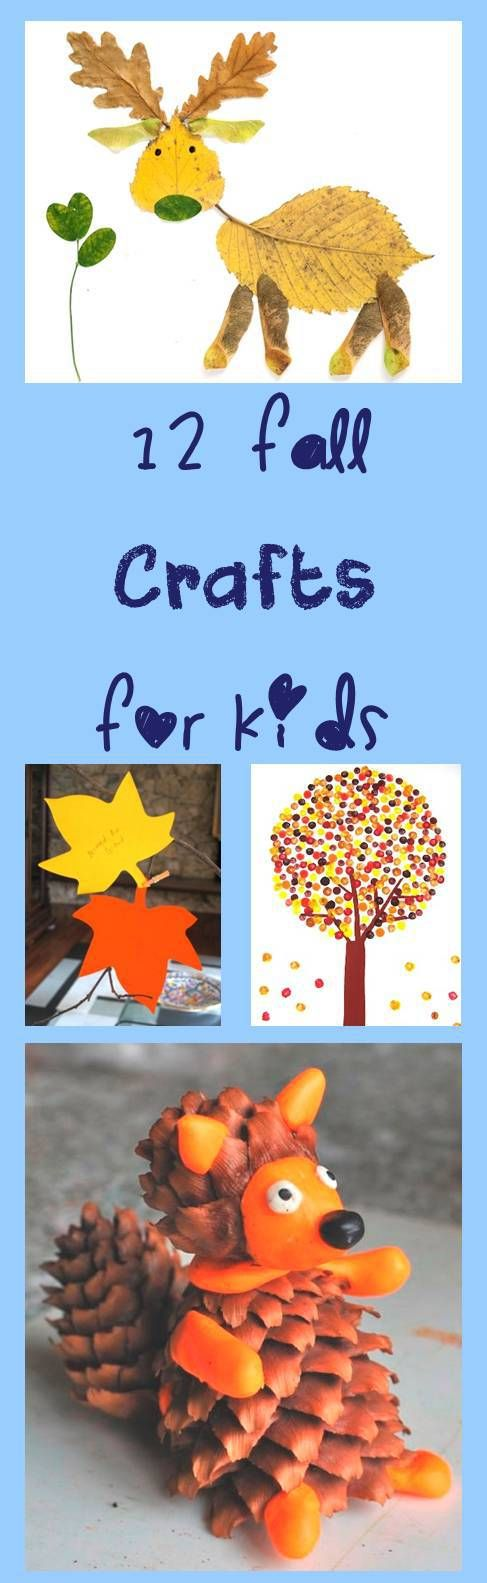 12 Fall Kids Crafts cheerandcherry